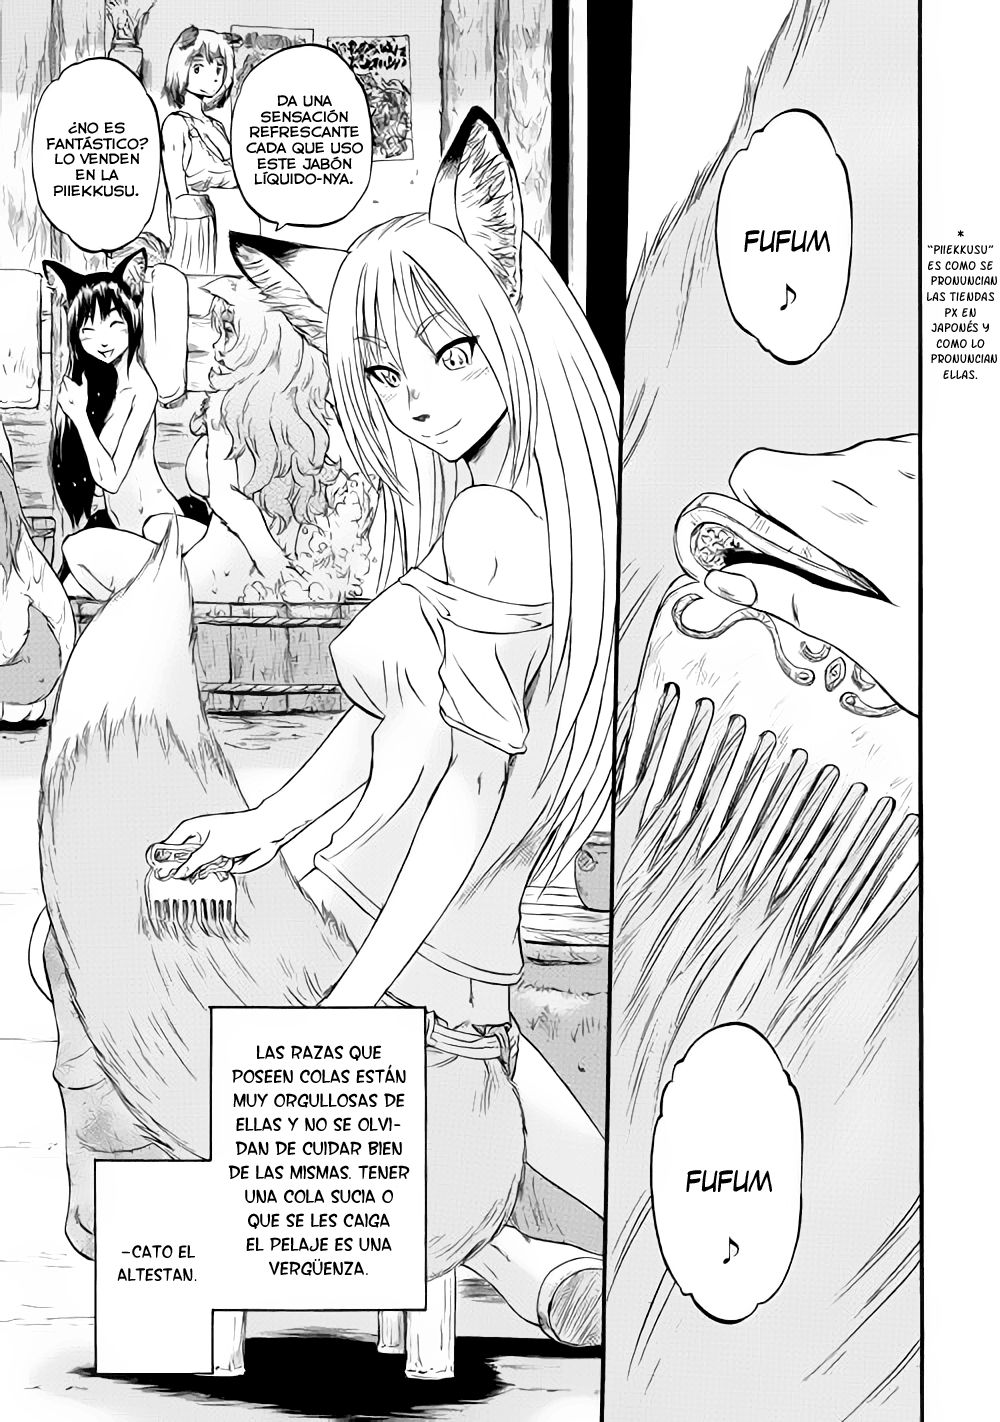 https://c9.mangatag.com/es_manga/pic3/59/187/588225/744a8caedb8d03af19637cdf277569c8.jpg Page 1